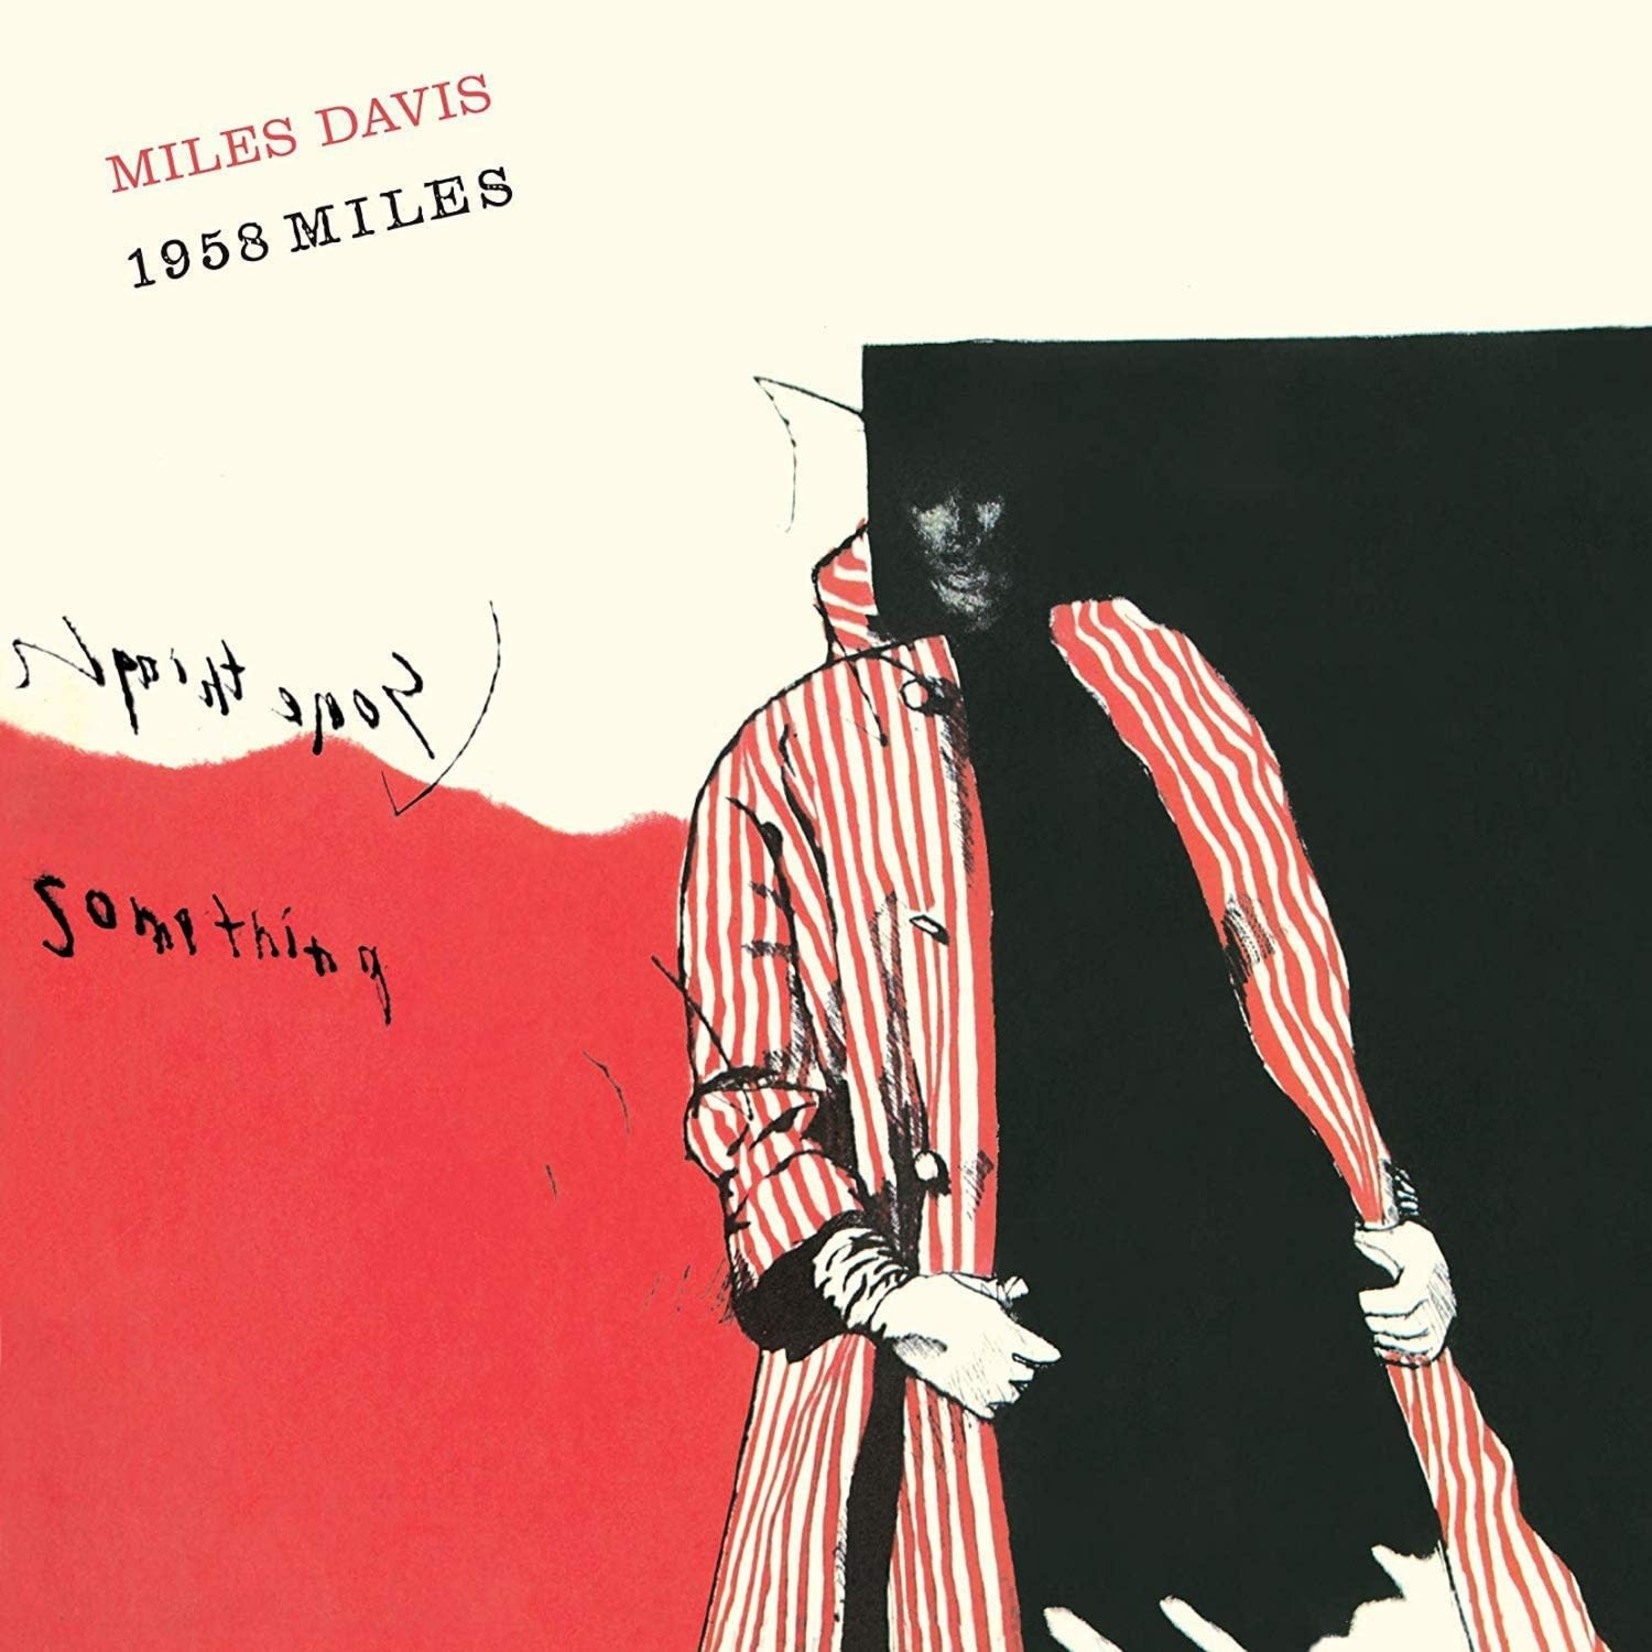 MILES DAVIS 1958 MILES + 2 BONUS TRACKS!